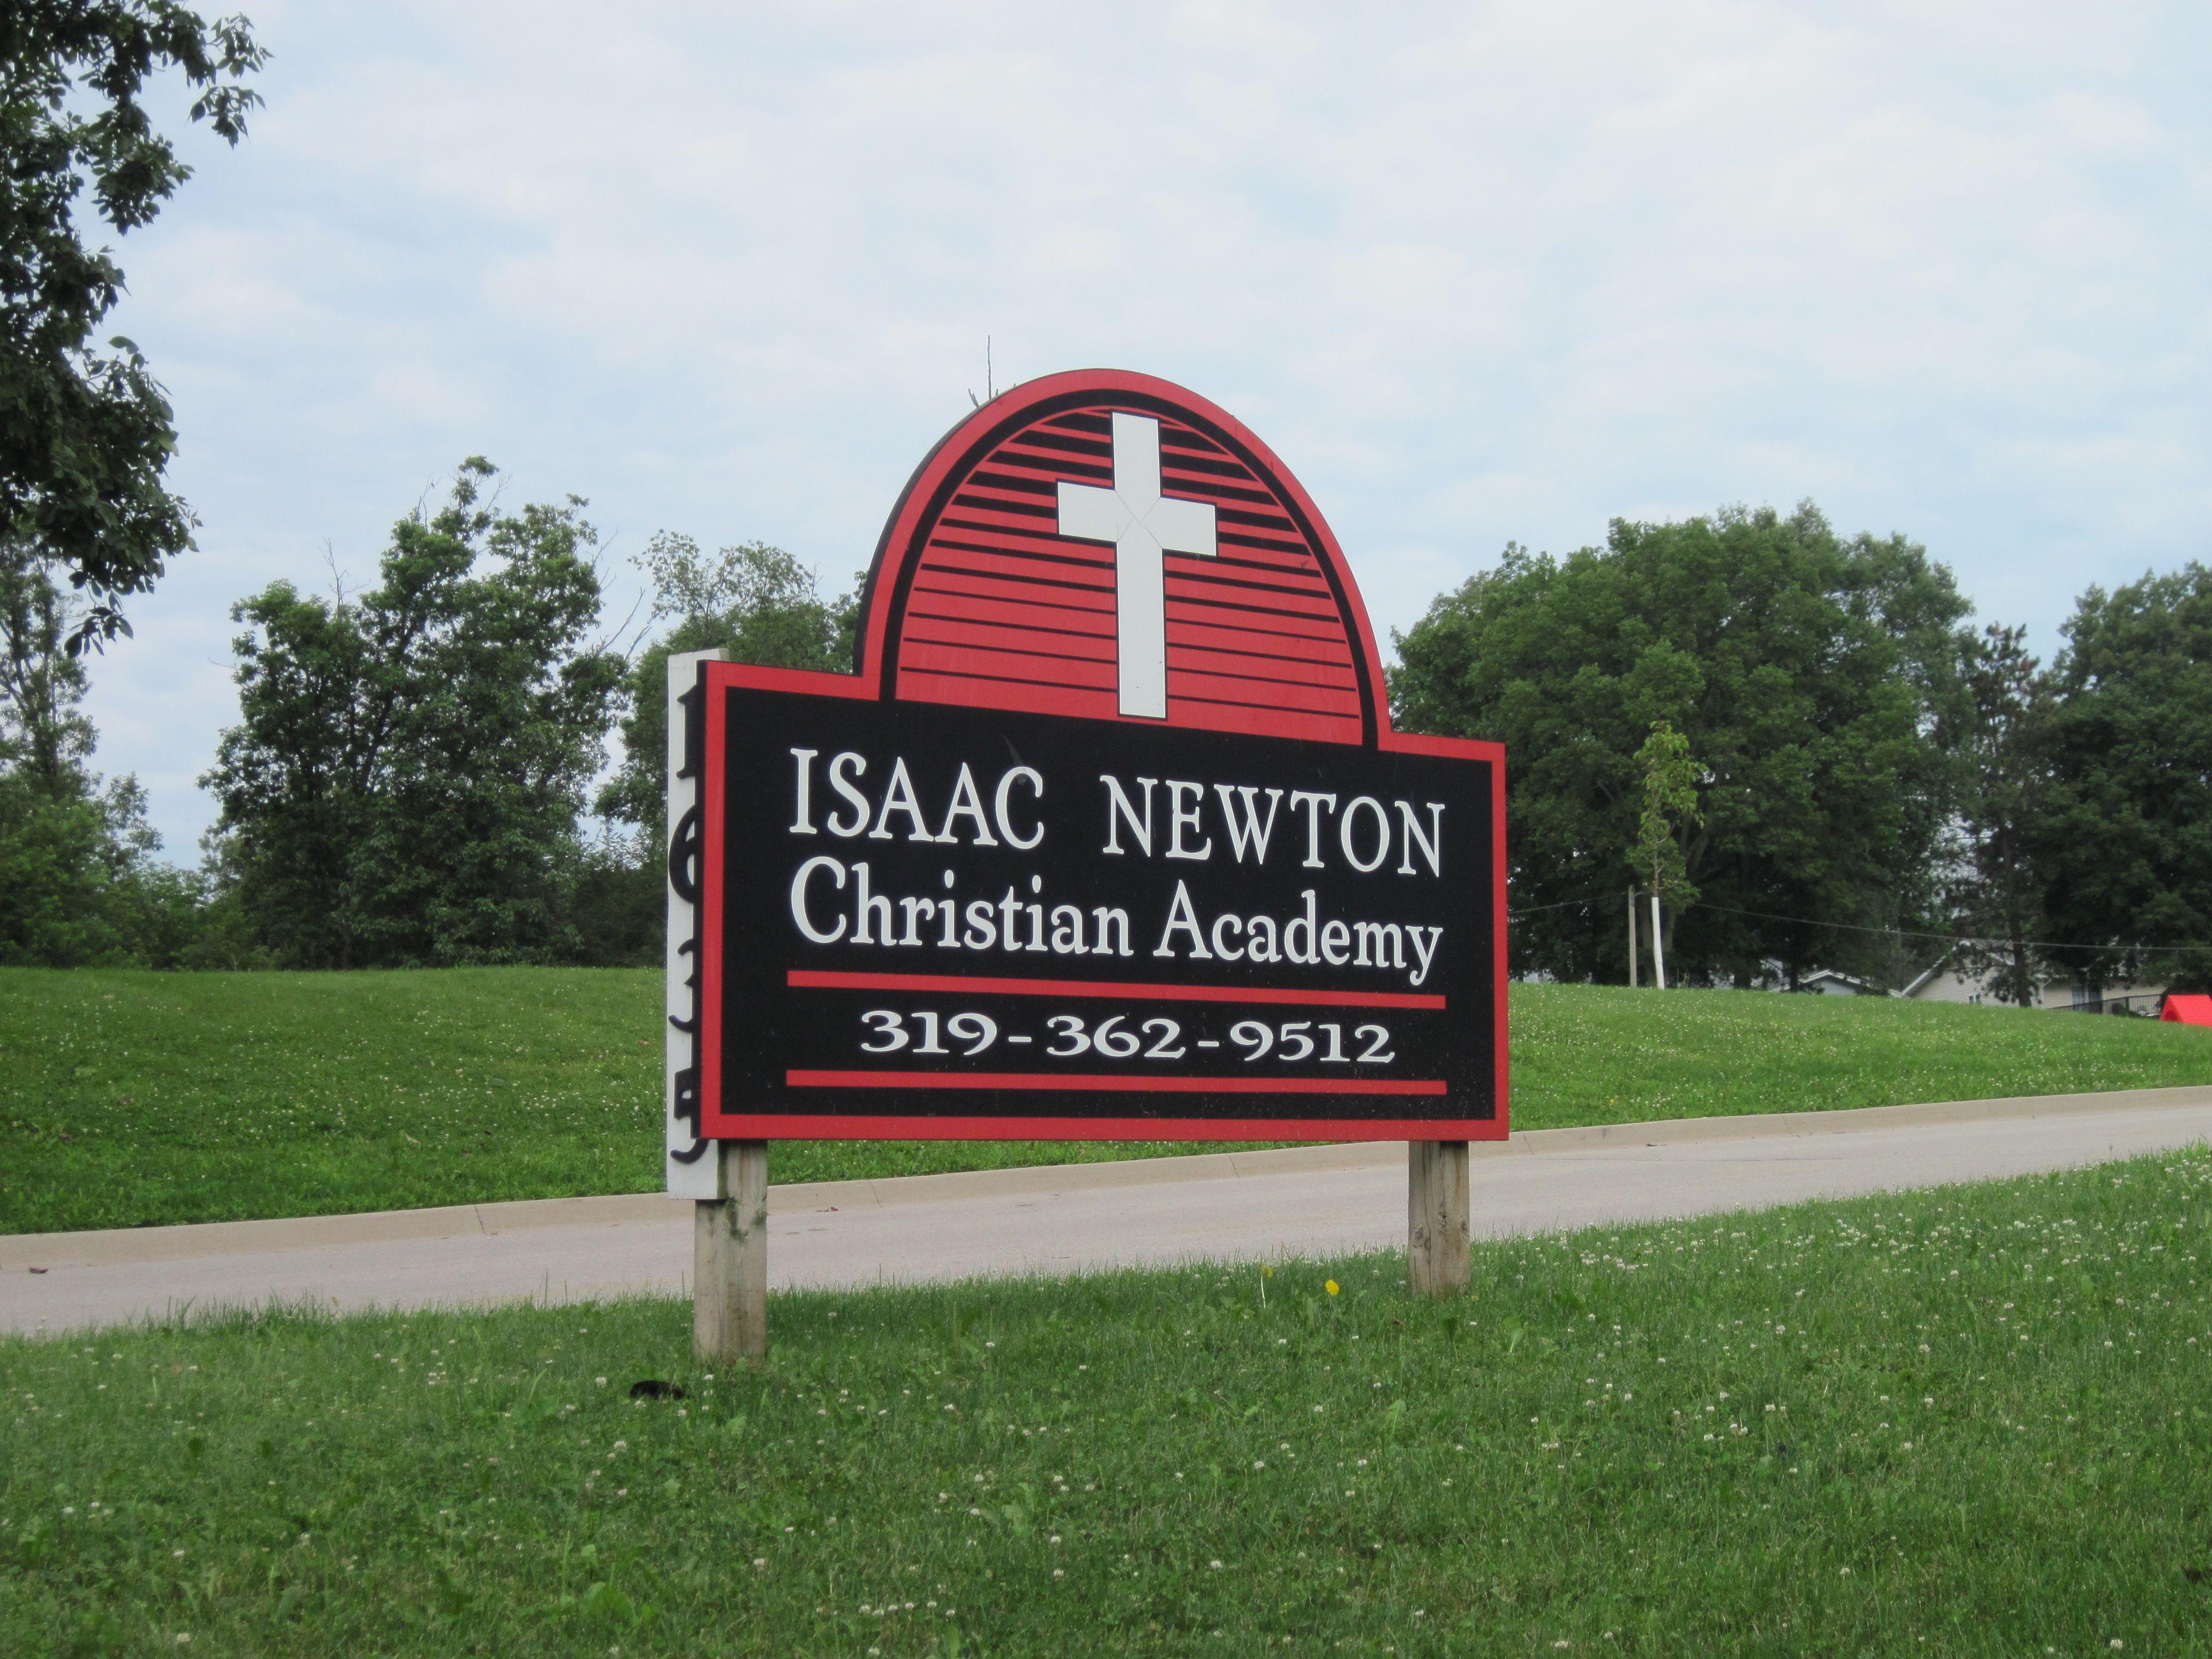 Isaac Newton Christian Academy Elementary School